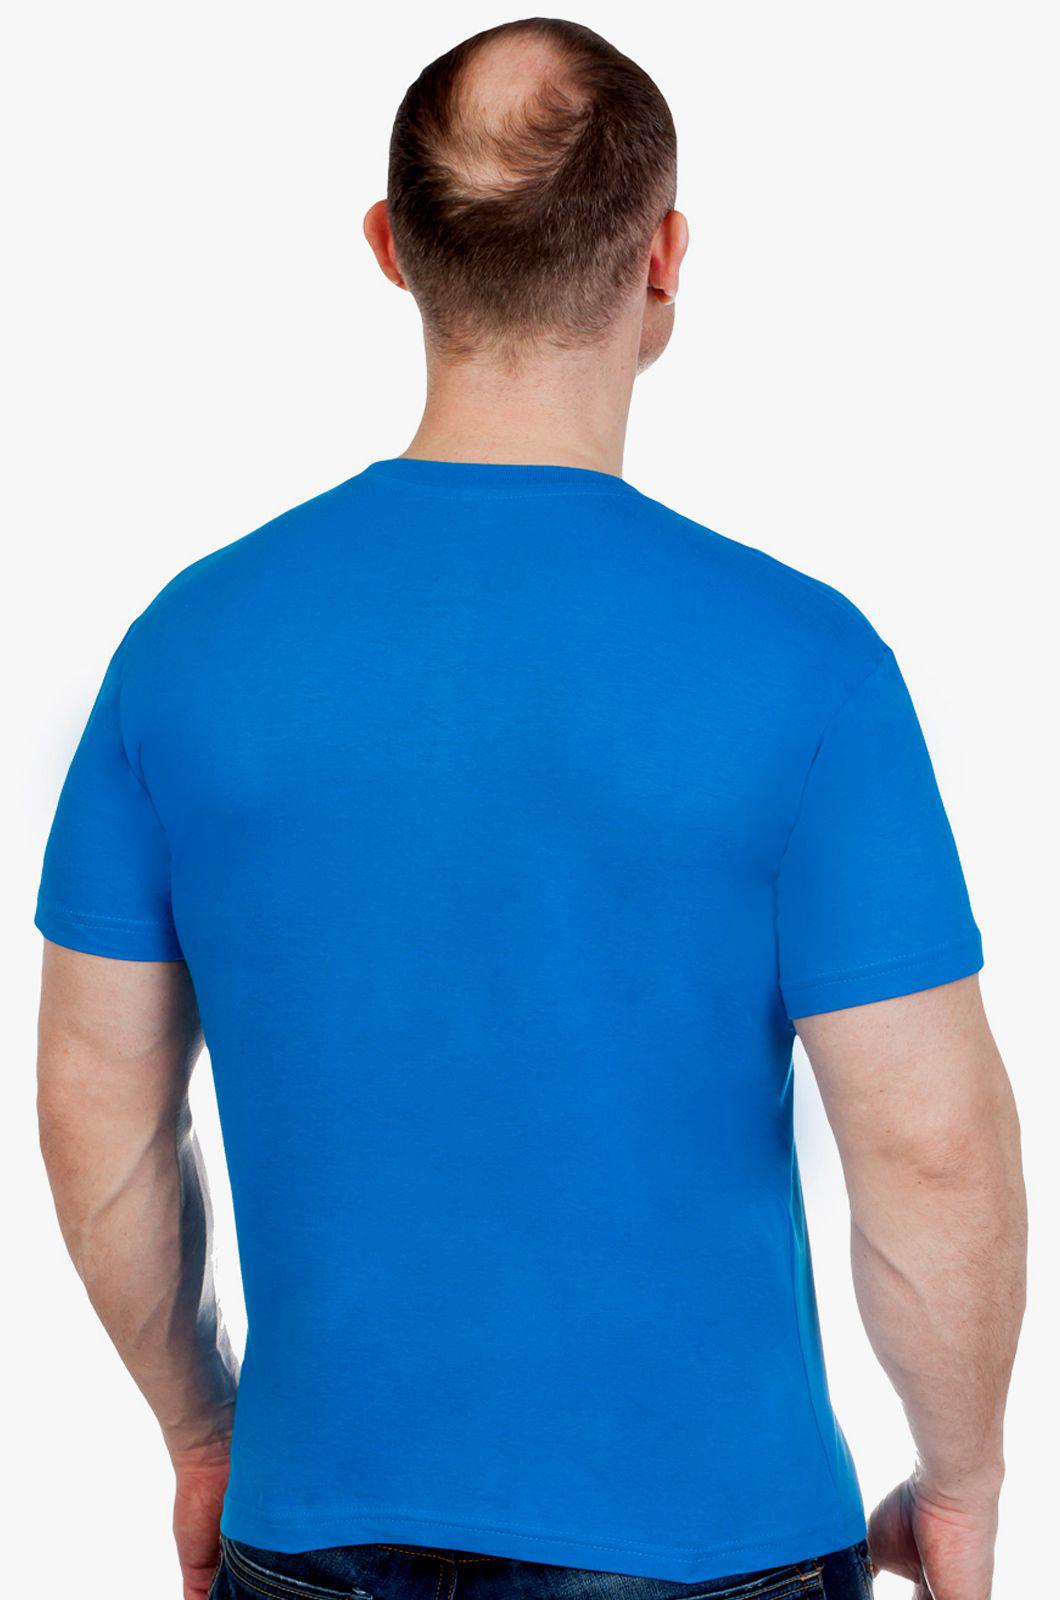 "Синяя футболка ""Тихоокеанский флот"" - купить онлайн"